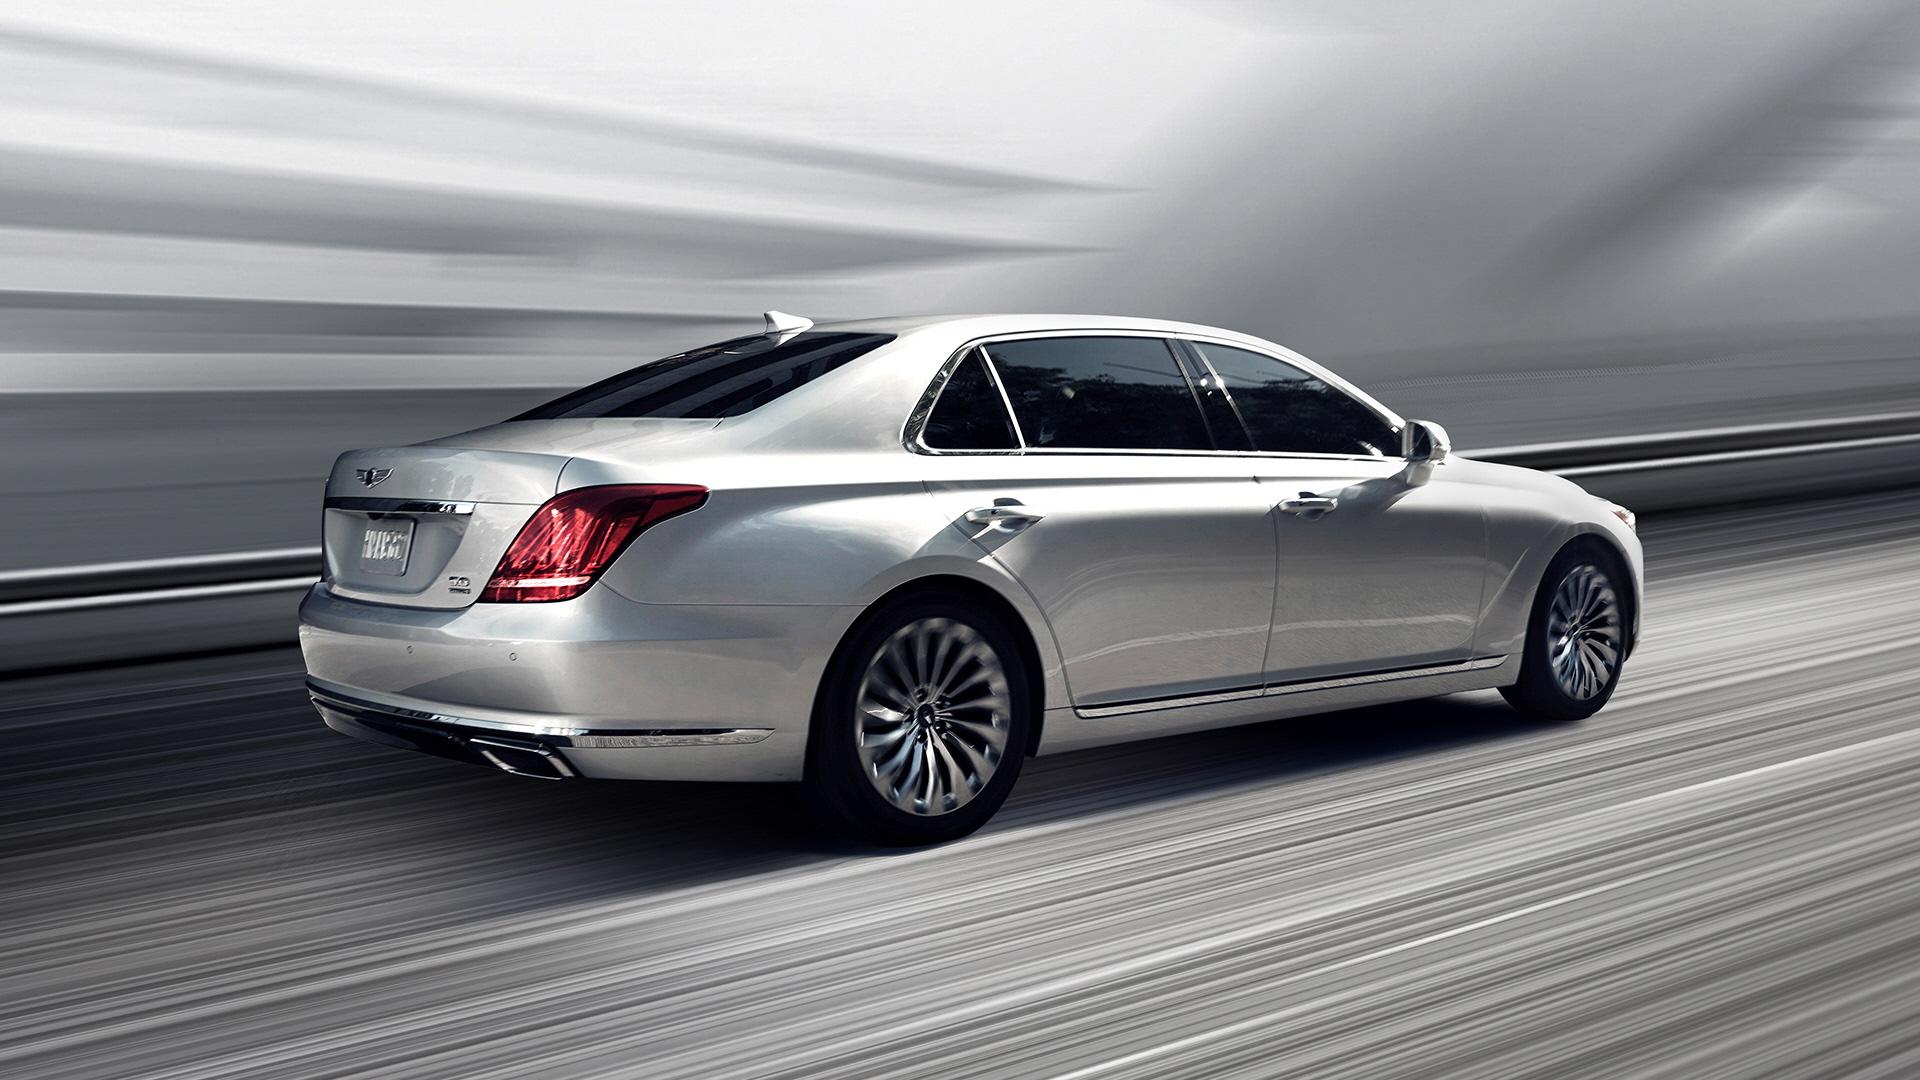 genesis g90 the new luxury midsize sedan genesis usa. Black Bedroom Furniture Sets. Home Design Ideas